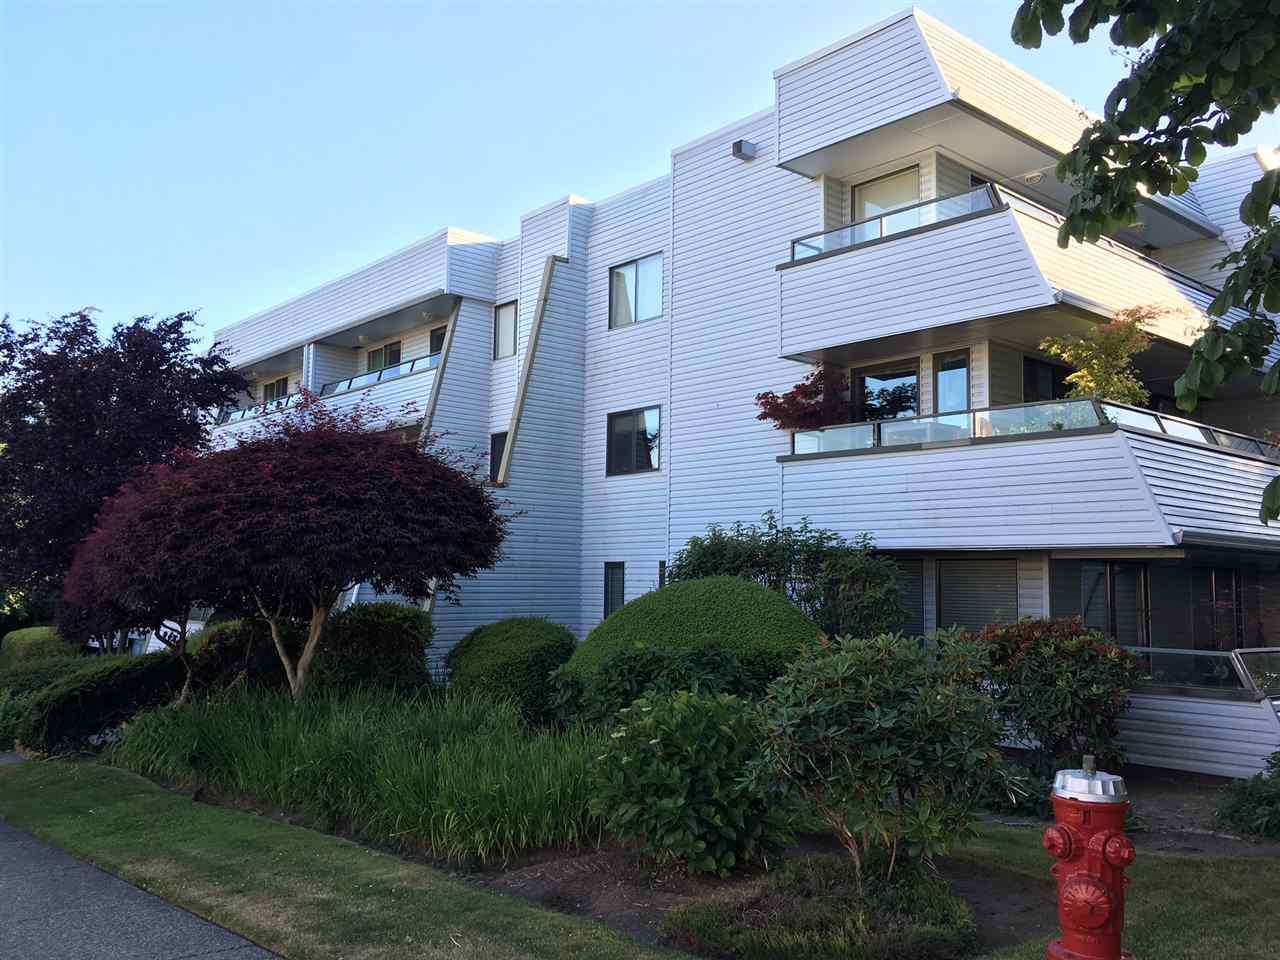 Condo Apartment at 103 1341 GEORGE STREET, Unit 103, South Surrey White Rock, British Columbia. Image 1